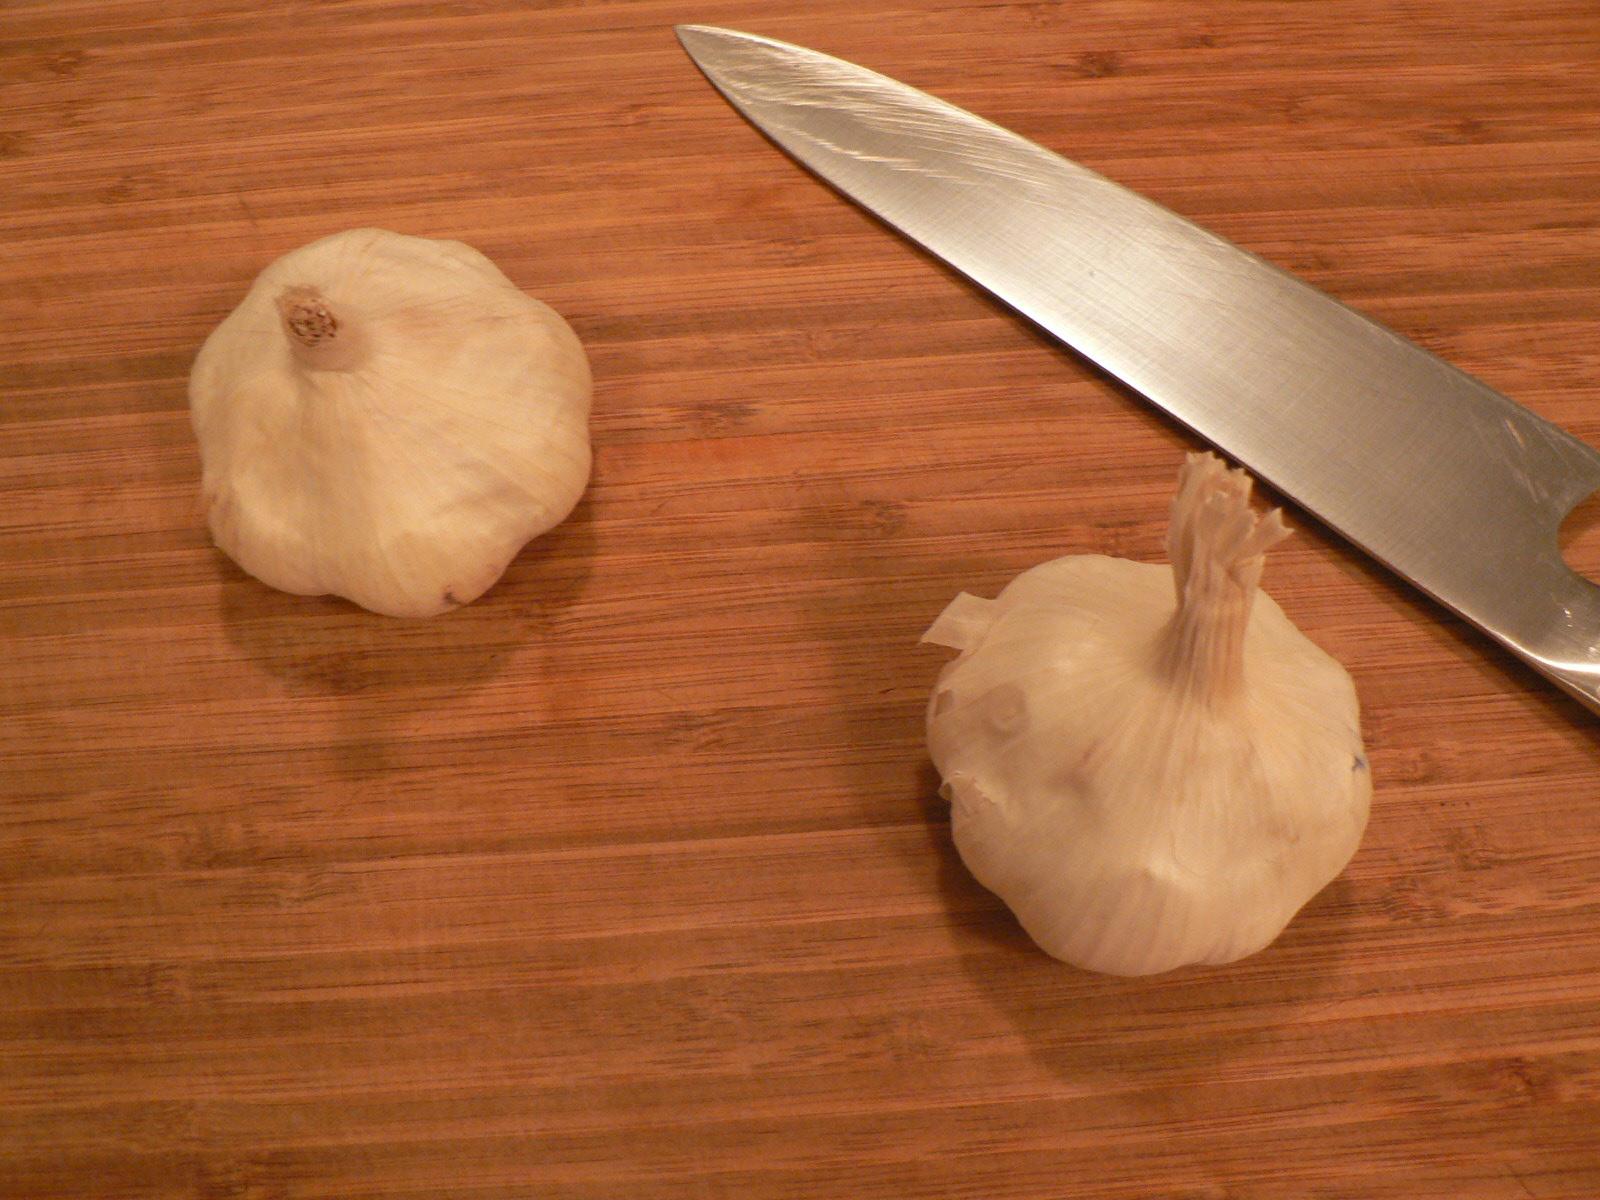 I love me some garlic